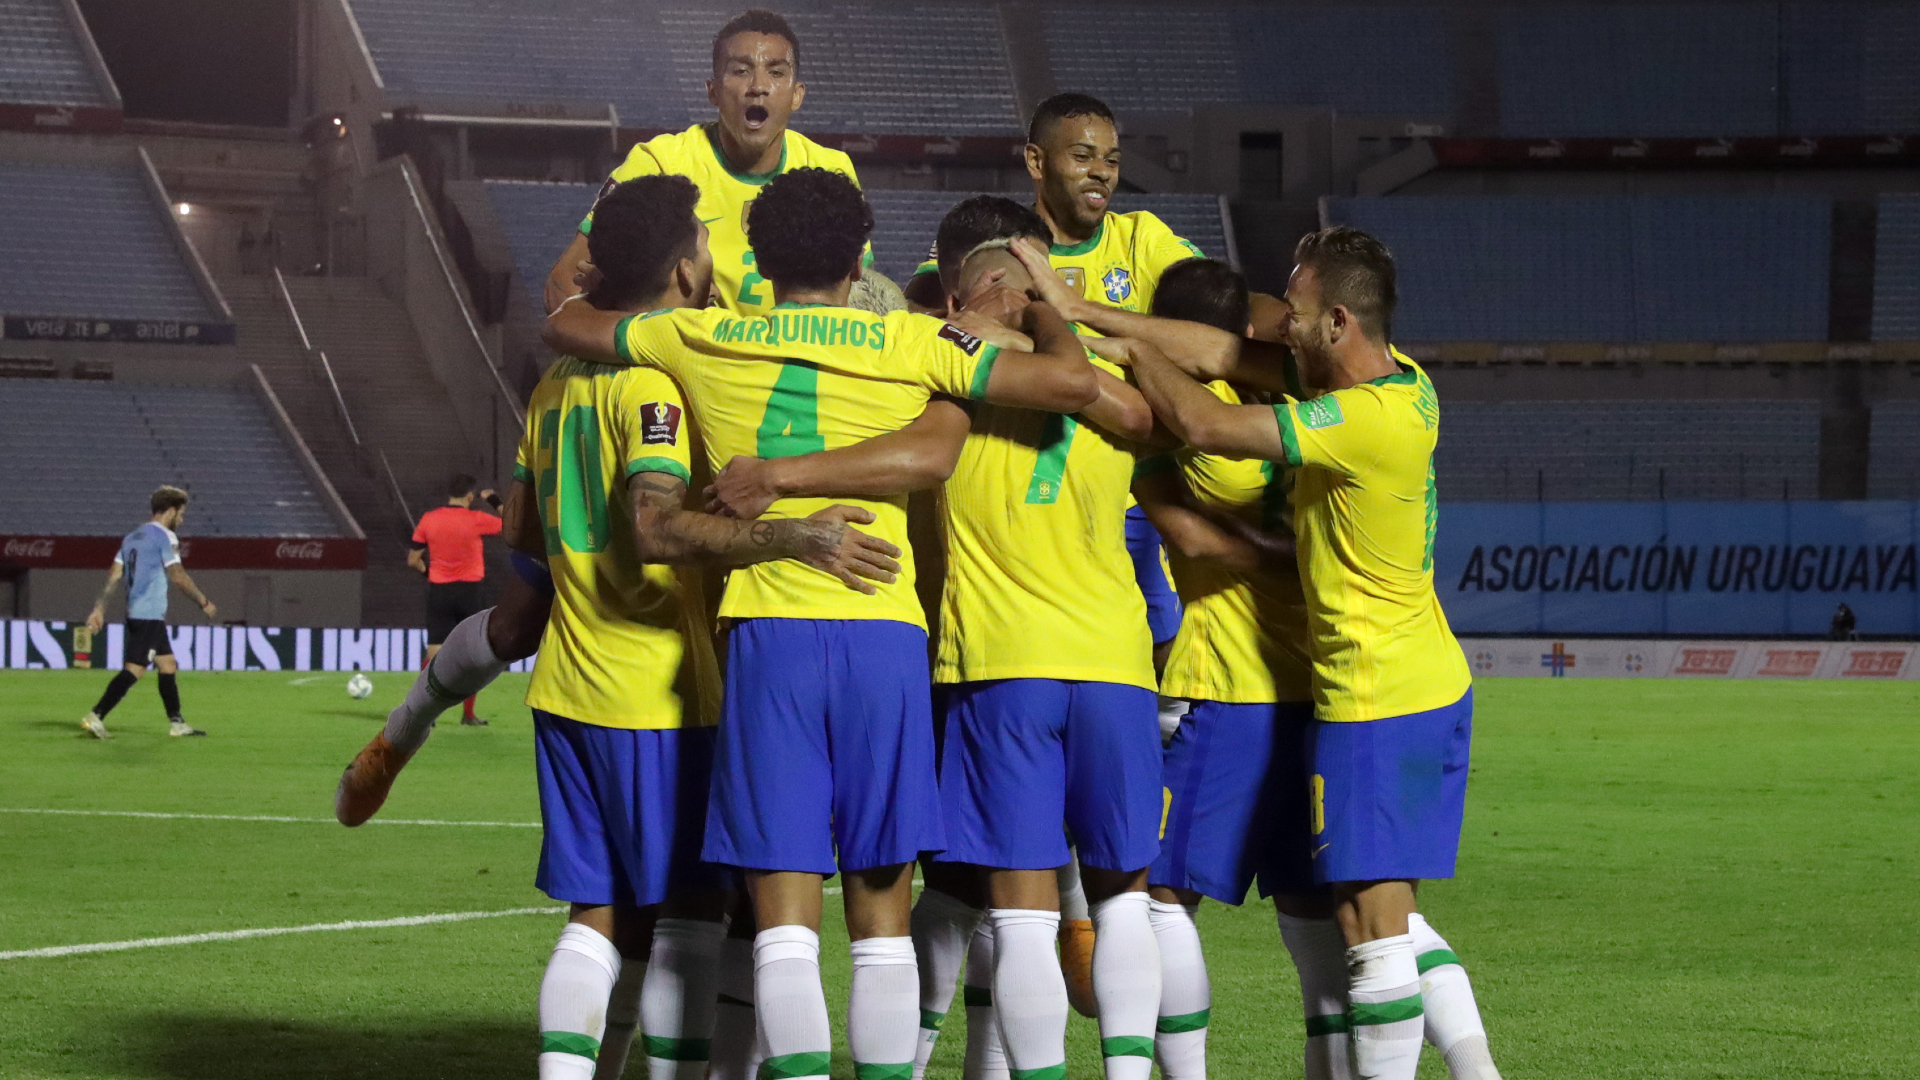 Uruguay 0-2 Brazil: Arthur, Richarlison help keep Tite's men perfect